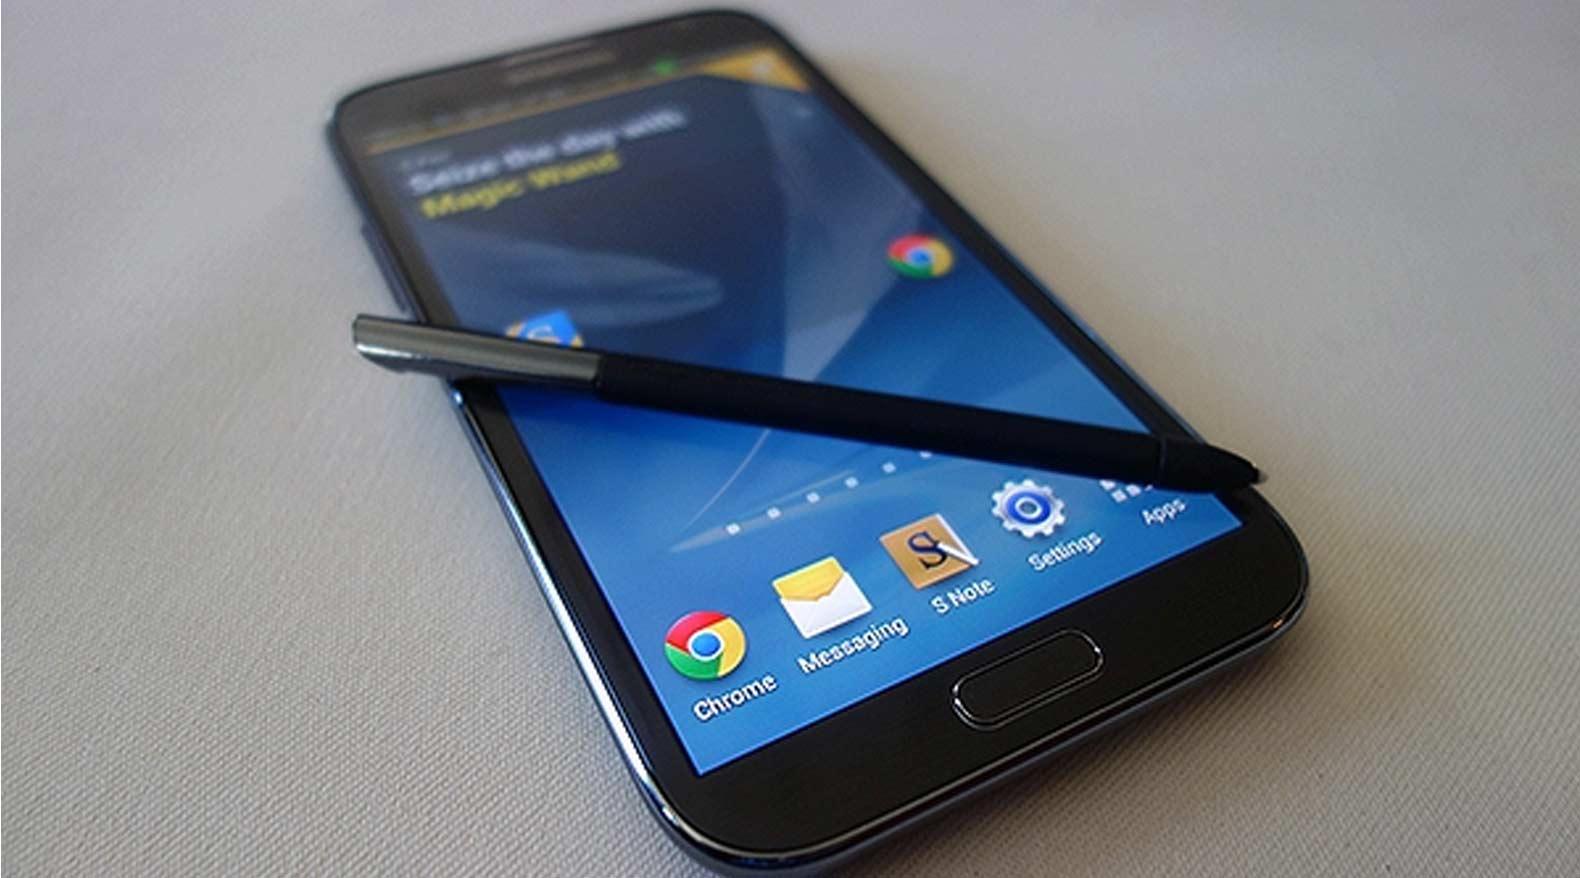 Samsung Galaxy Note 2 : passage vers Android 5.0 Lollipop à venir !